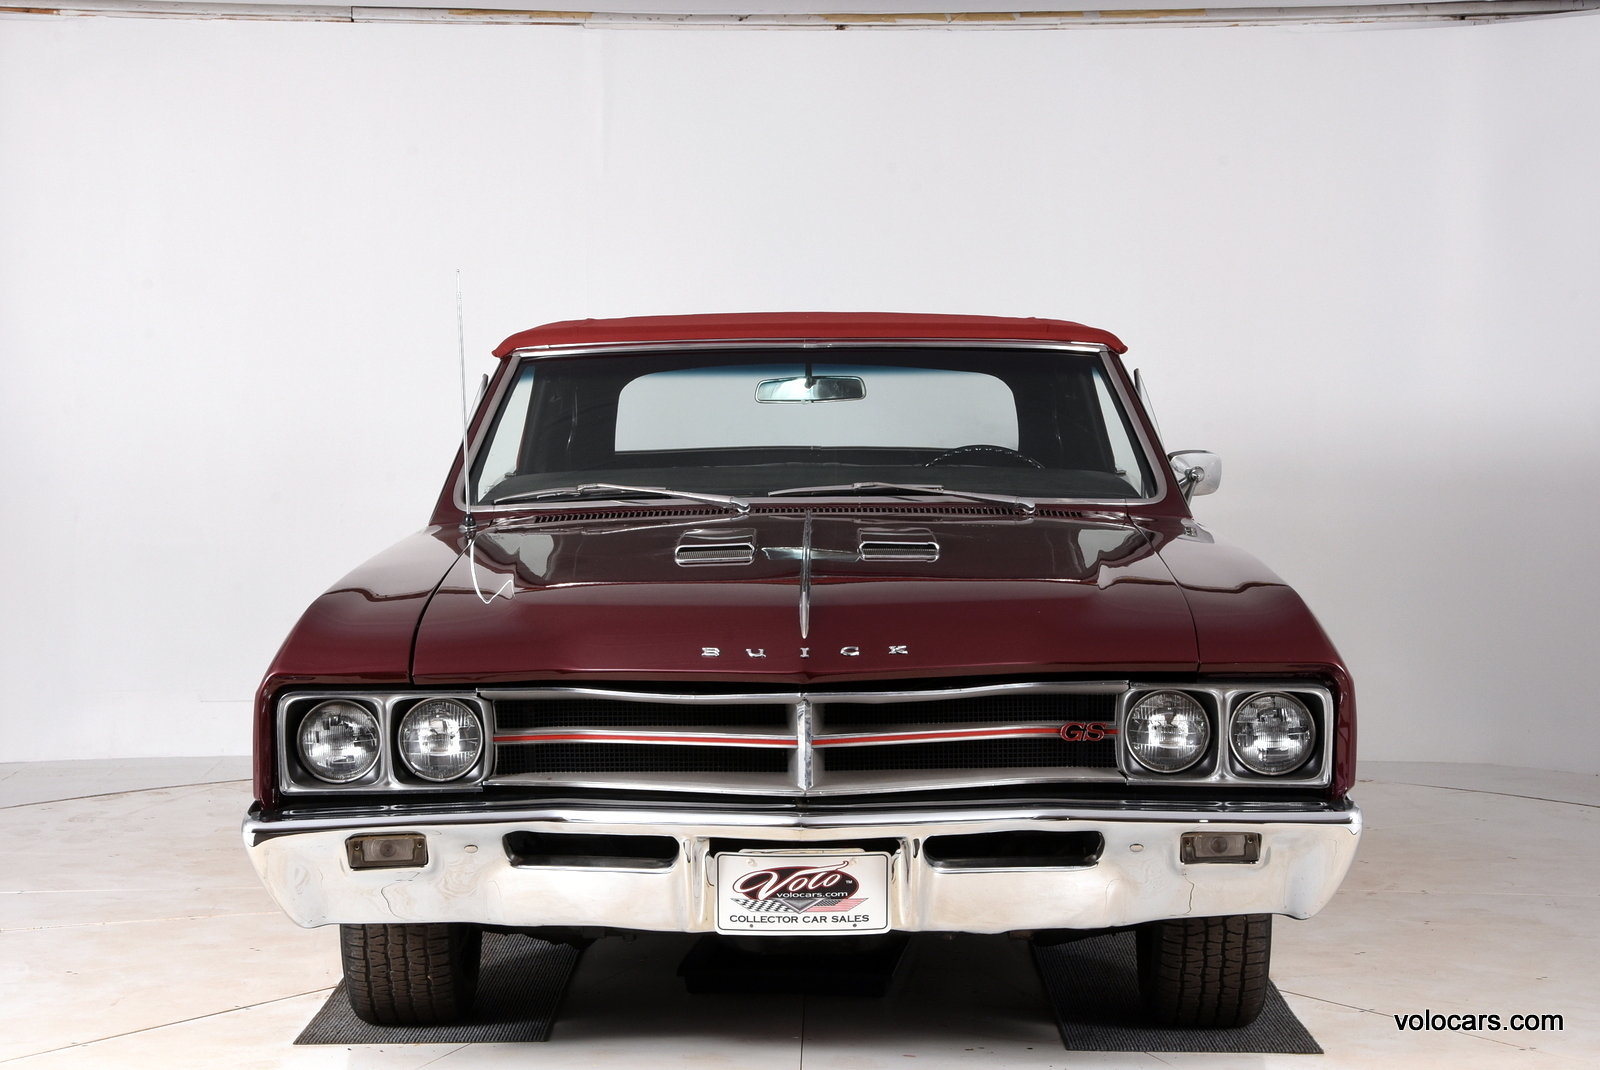 1967 buick gs 400 for sale 84147 mcg. Black Bedroom Furniture Sets. Home Design Ideas